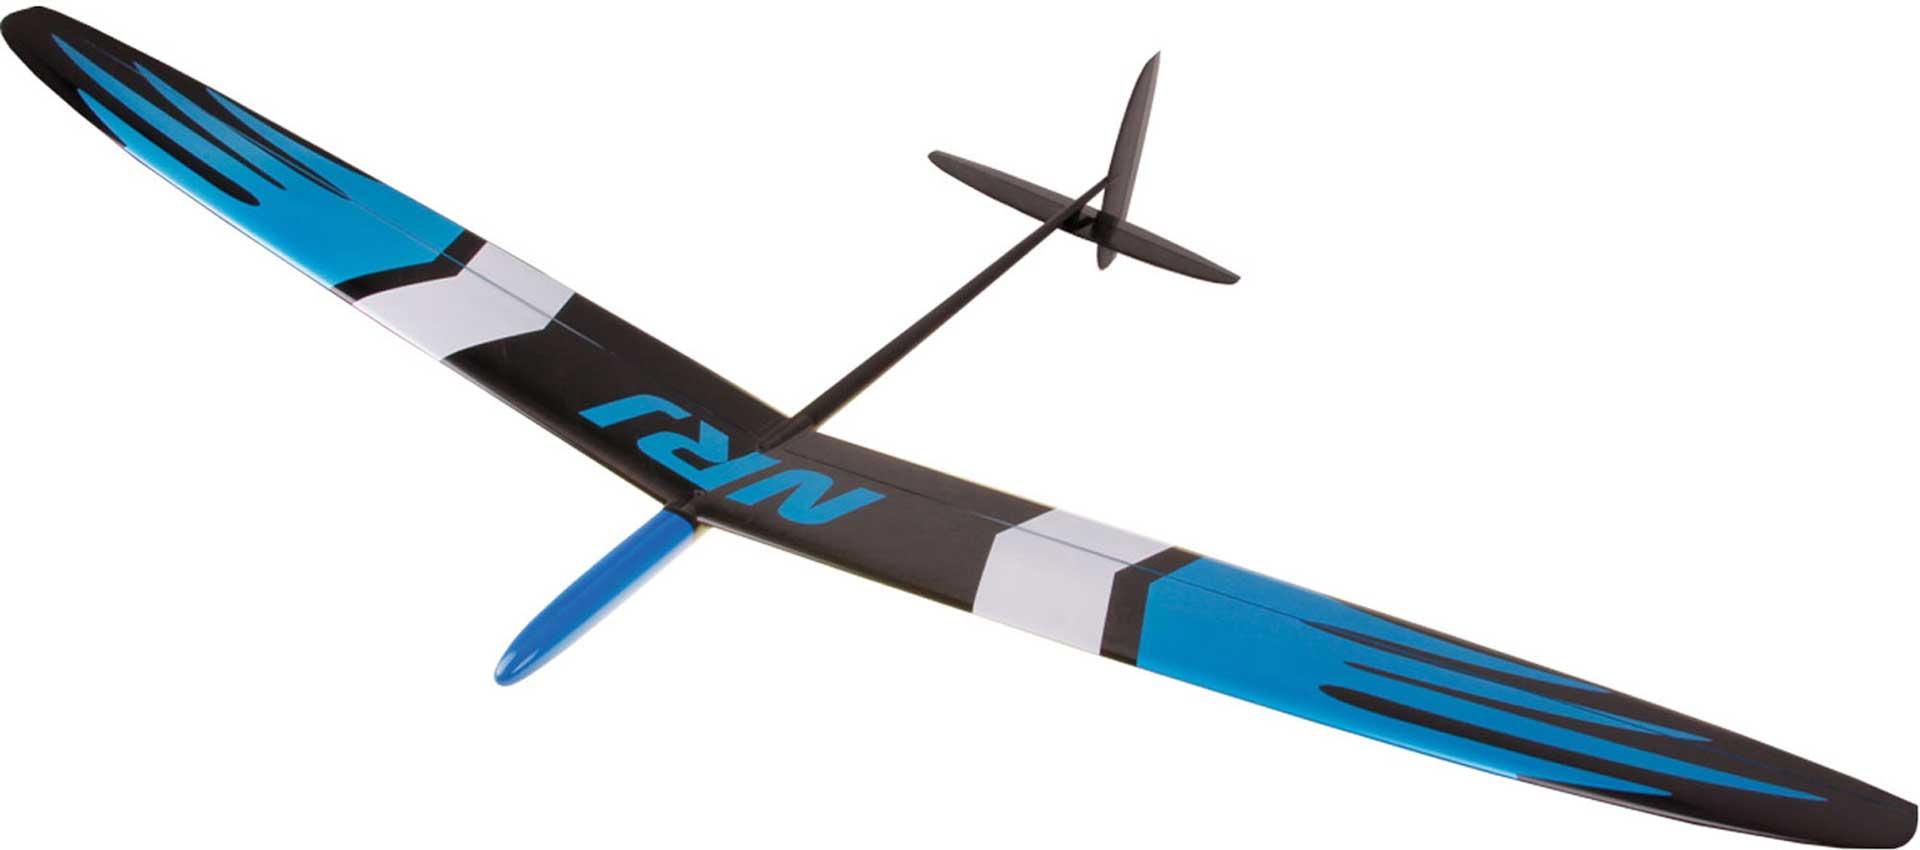 OA-COMPOSITES NRJ F3K BLUE # 5 EXTREME 60 SPIN GLIDER